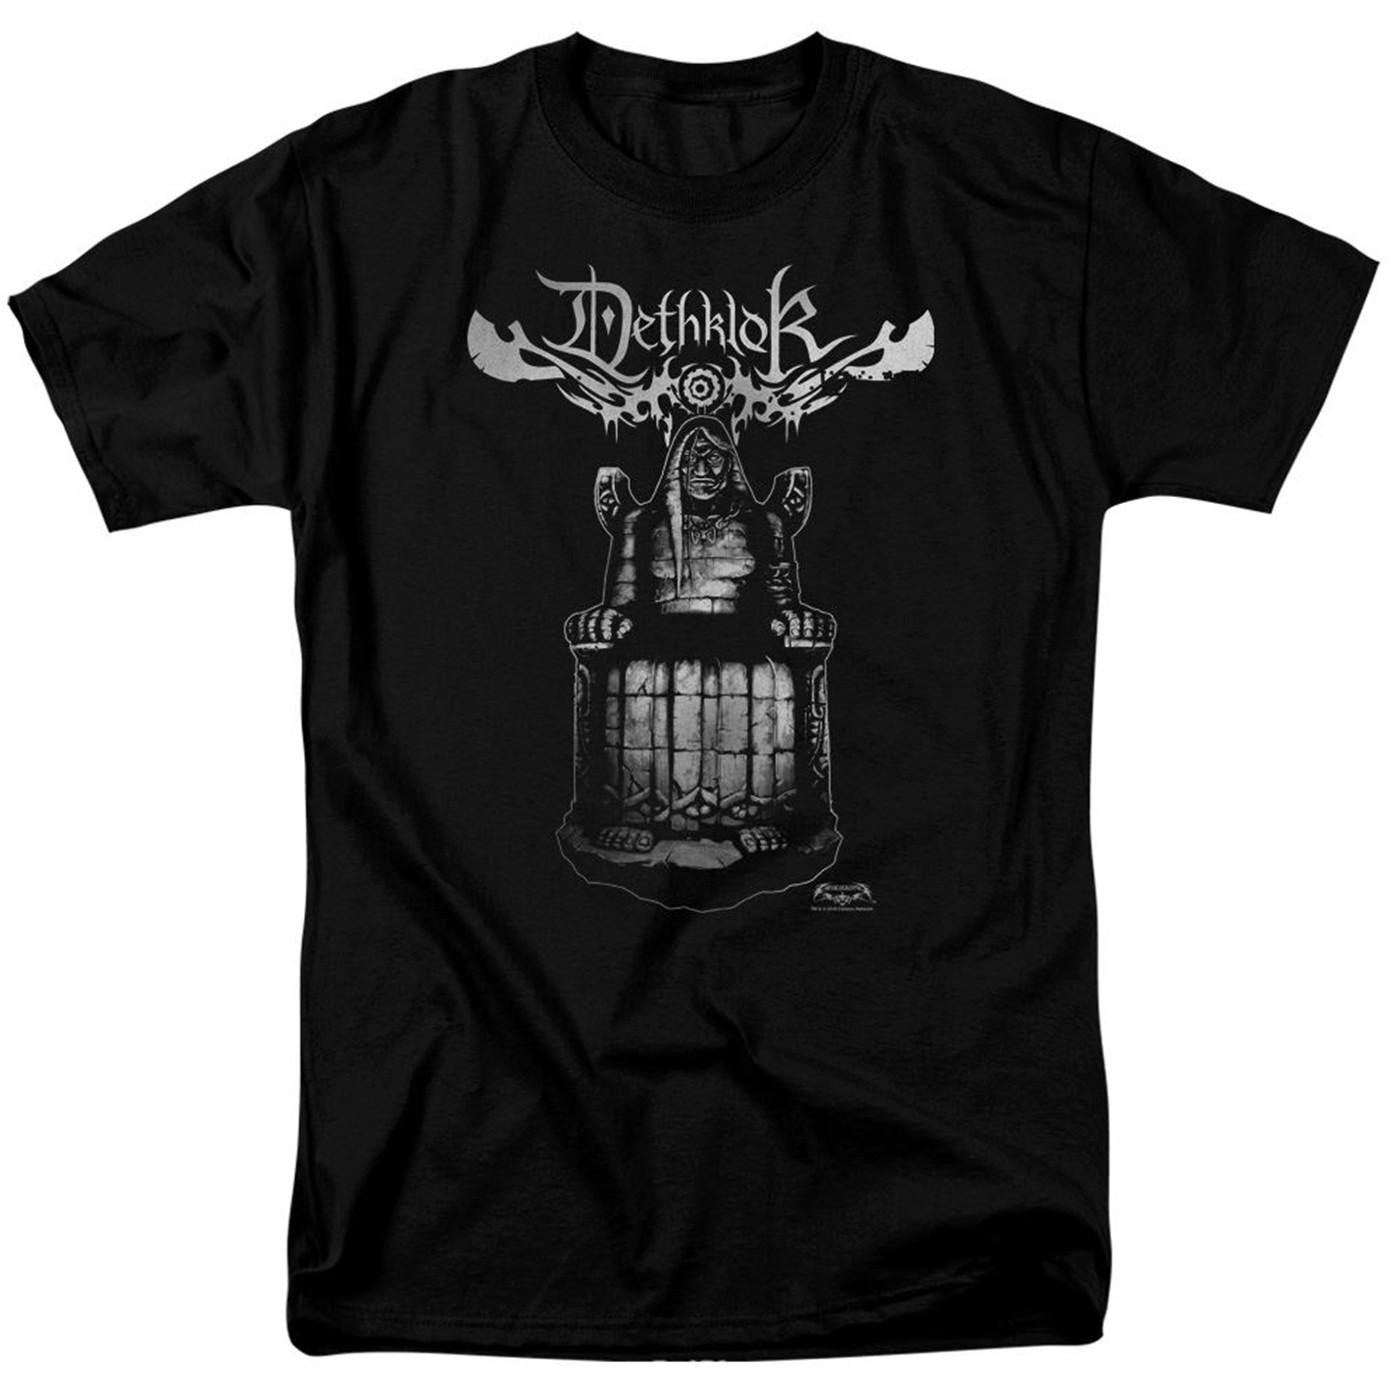 Metalocalypse Dethklok Statue Men's Black T-Shirt